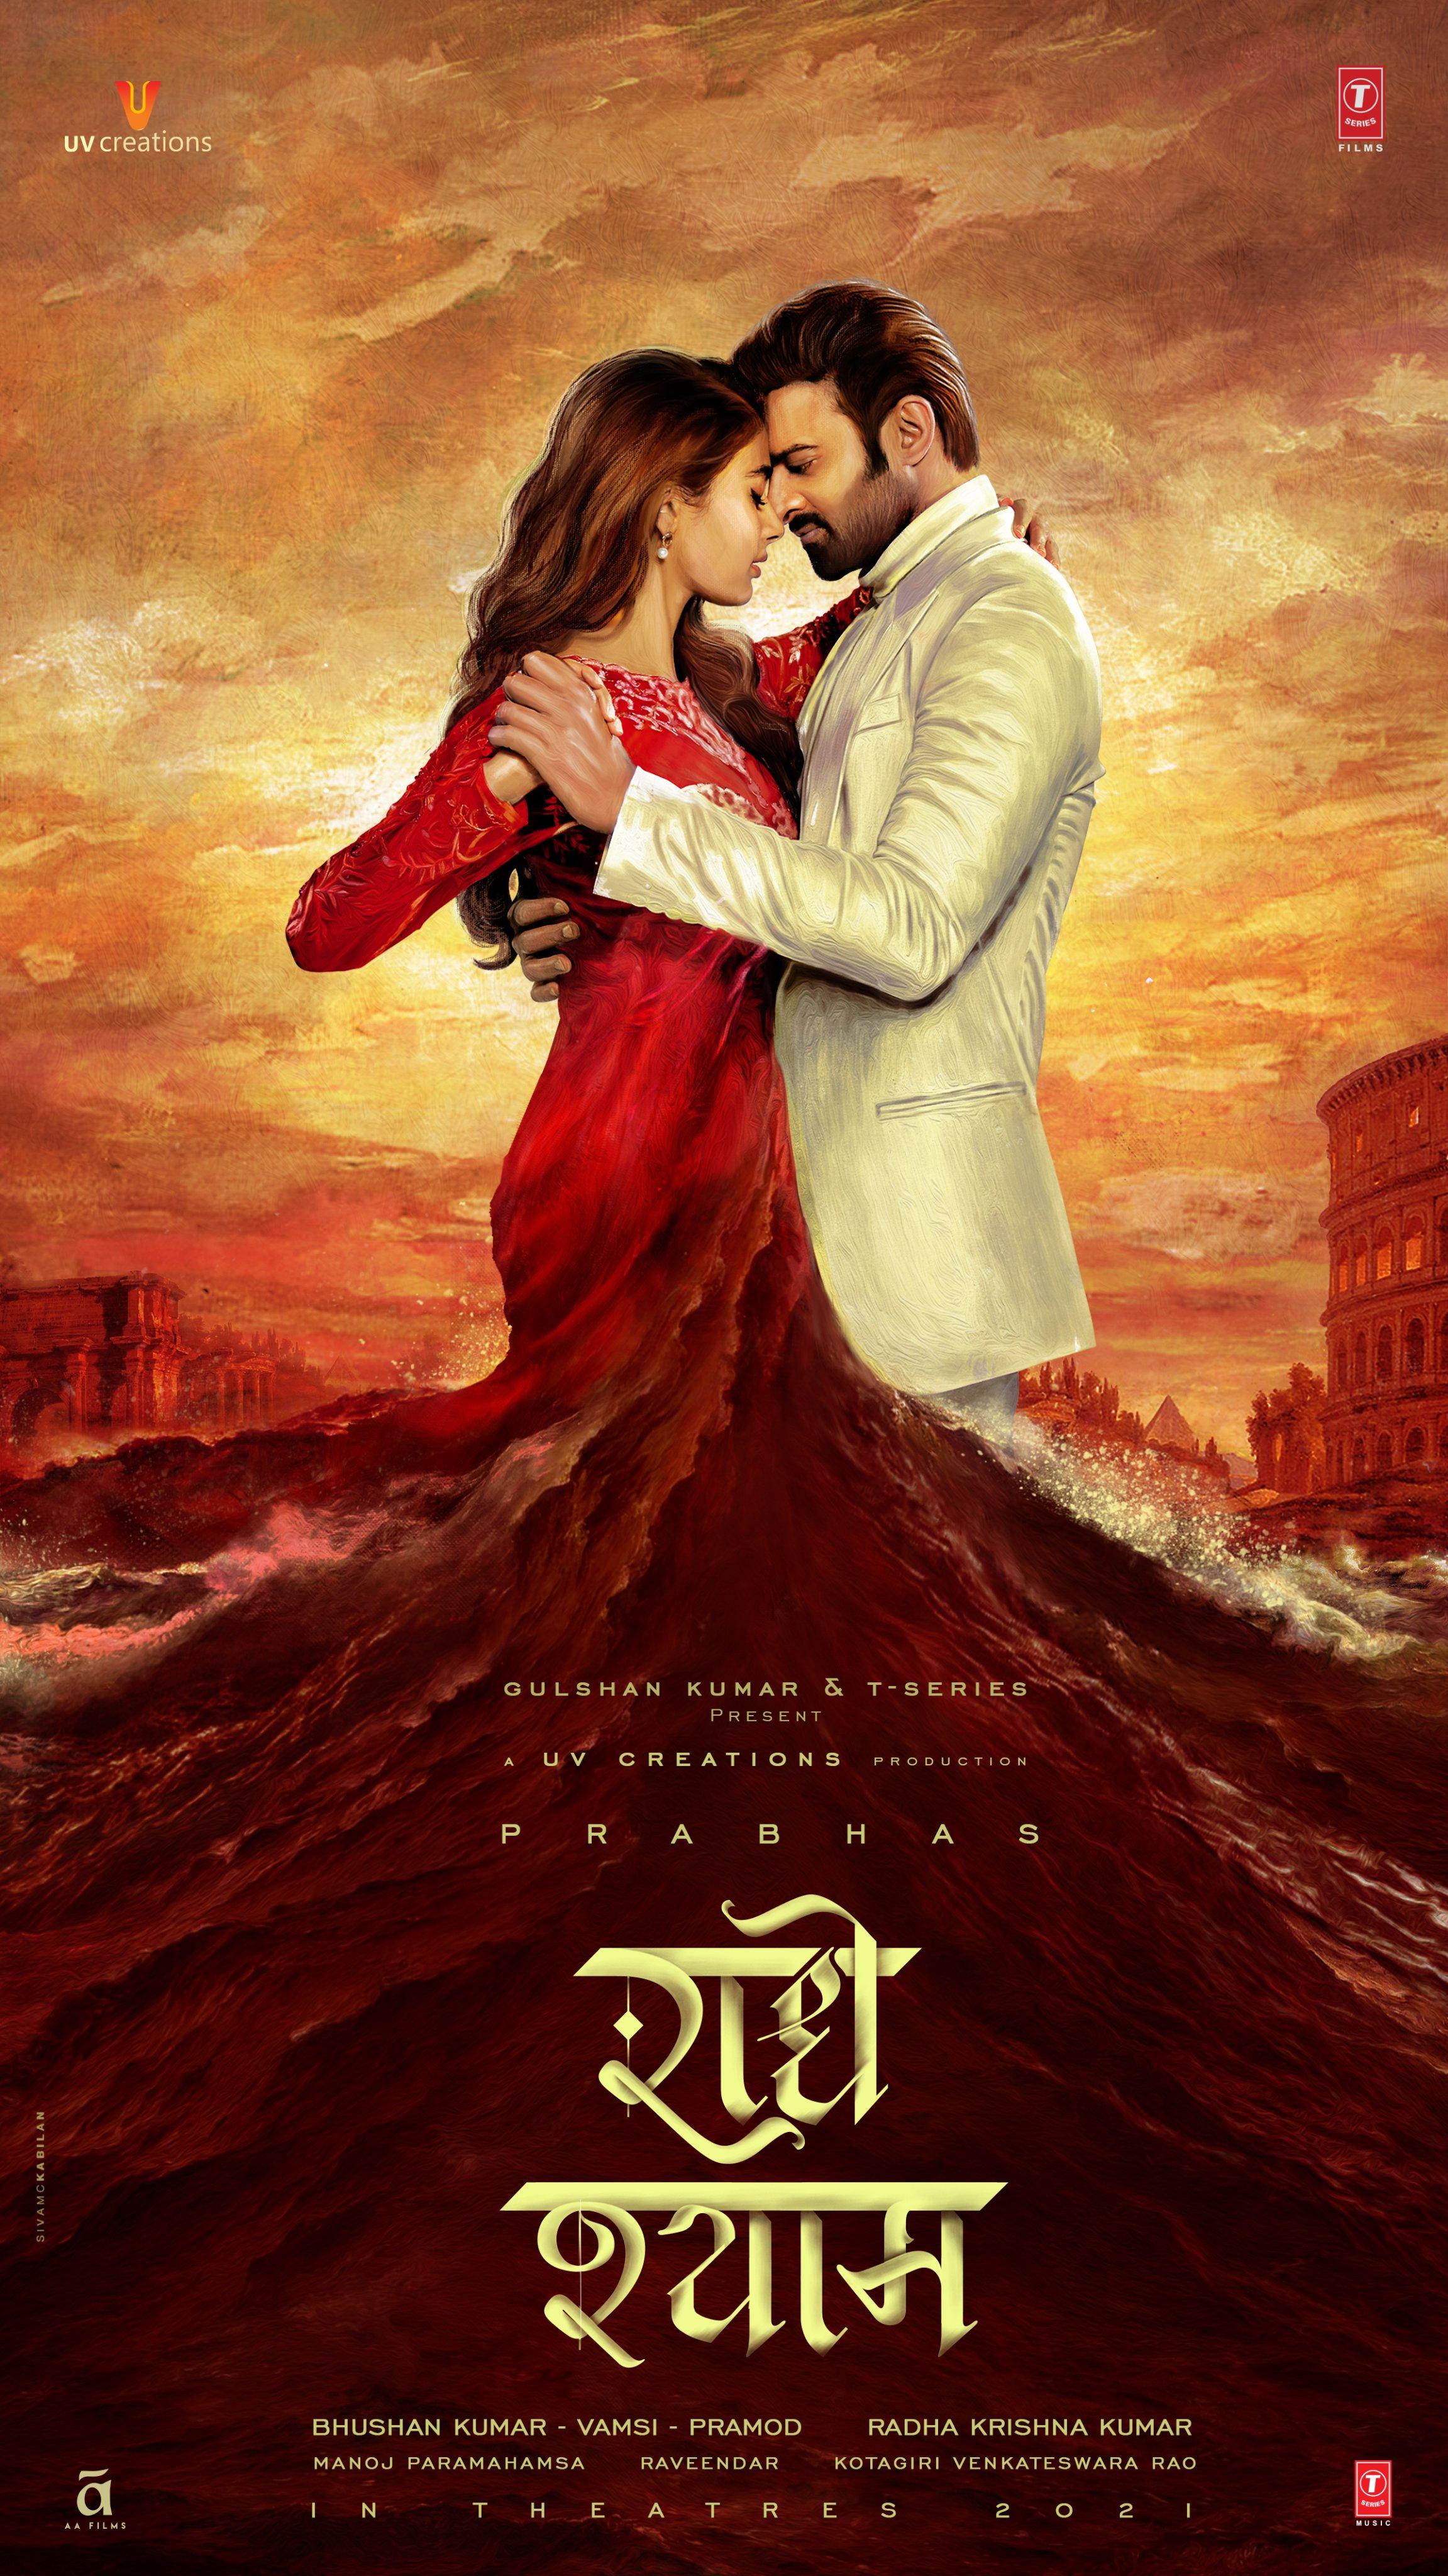 Download Radhe Shyam2021 hd print Full Movie filmyzilla720p 1080p